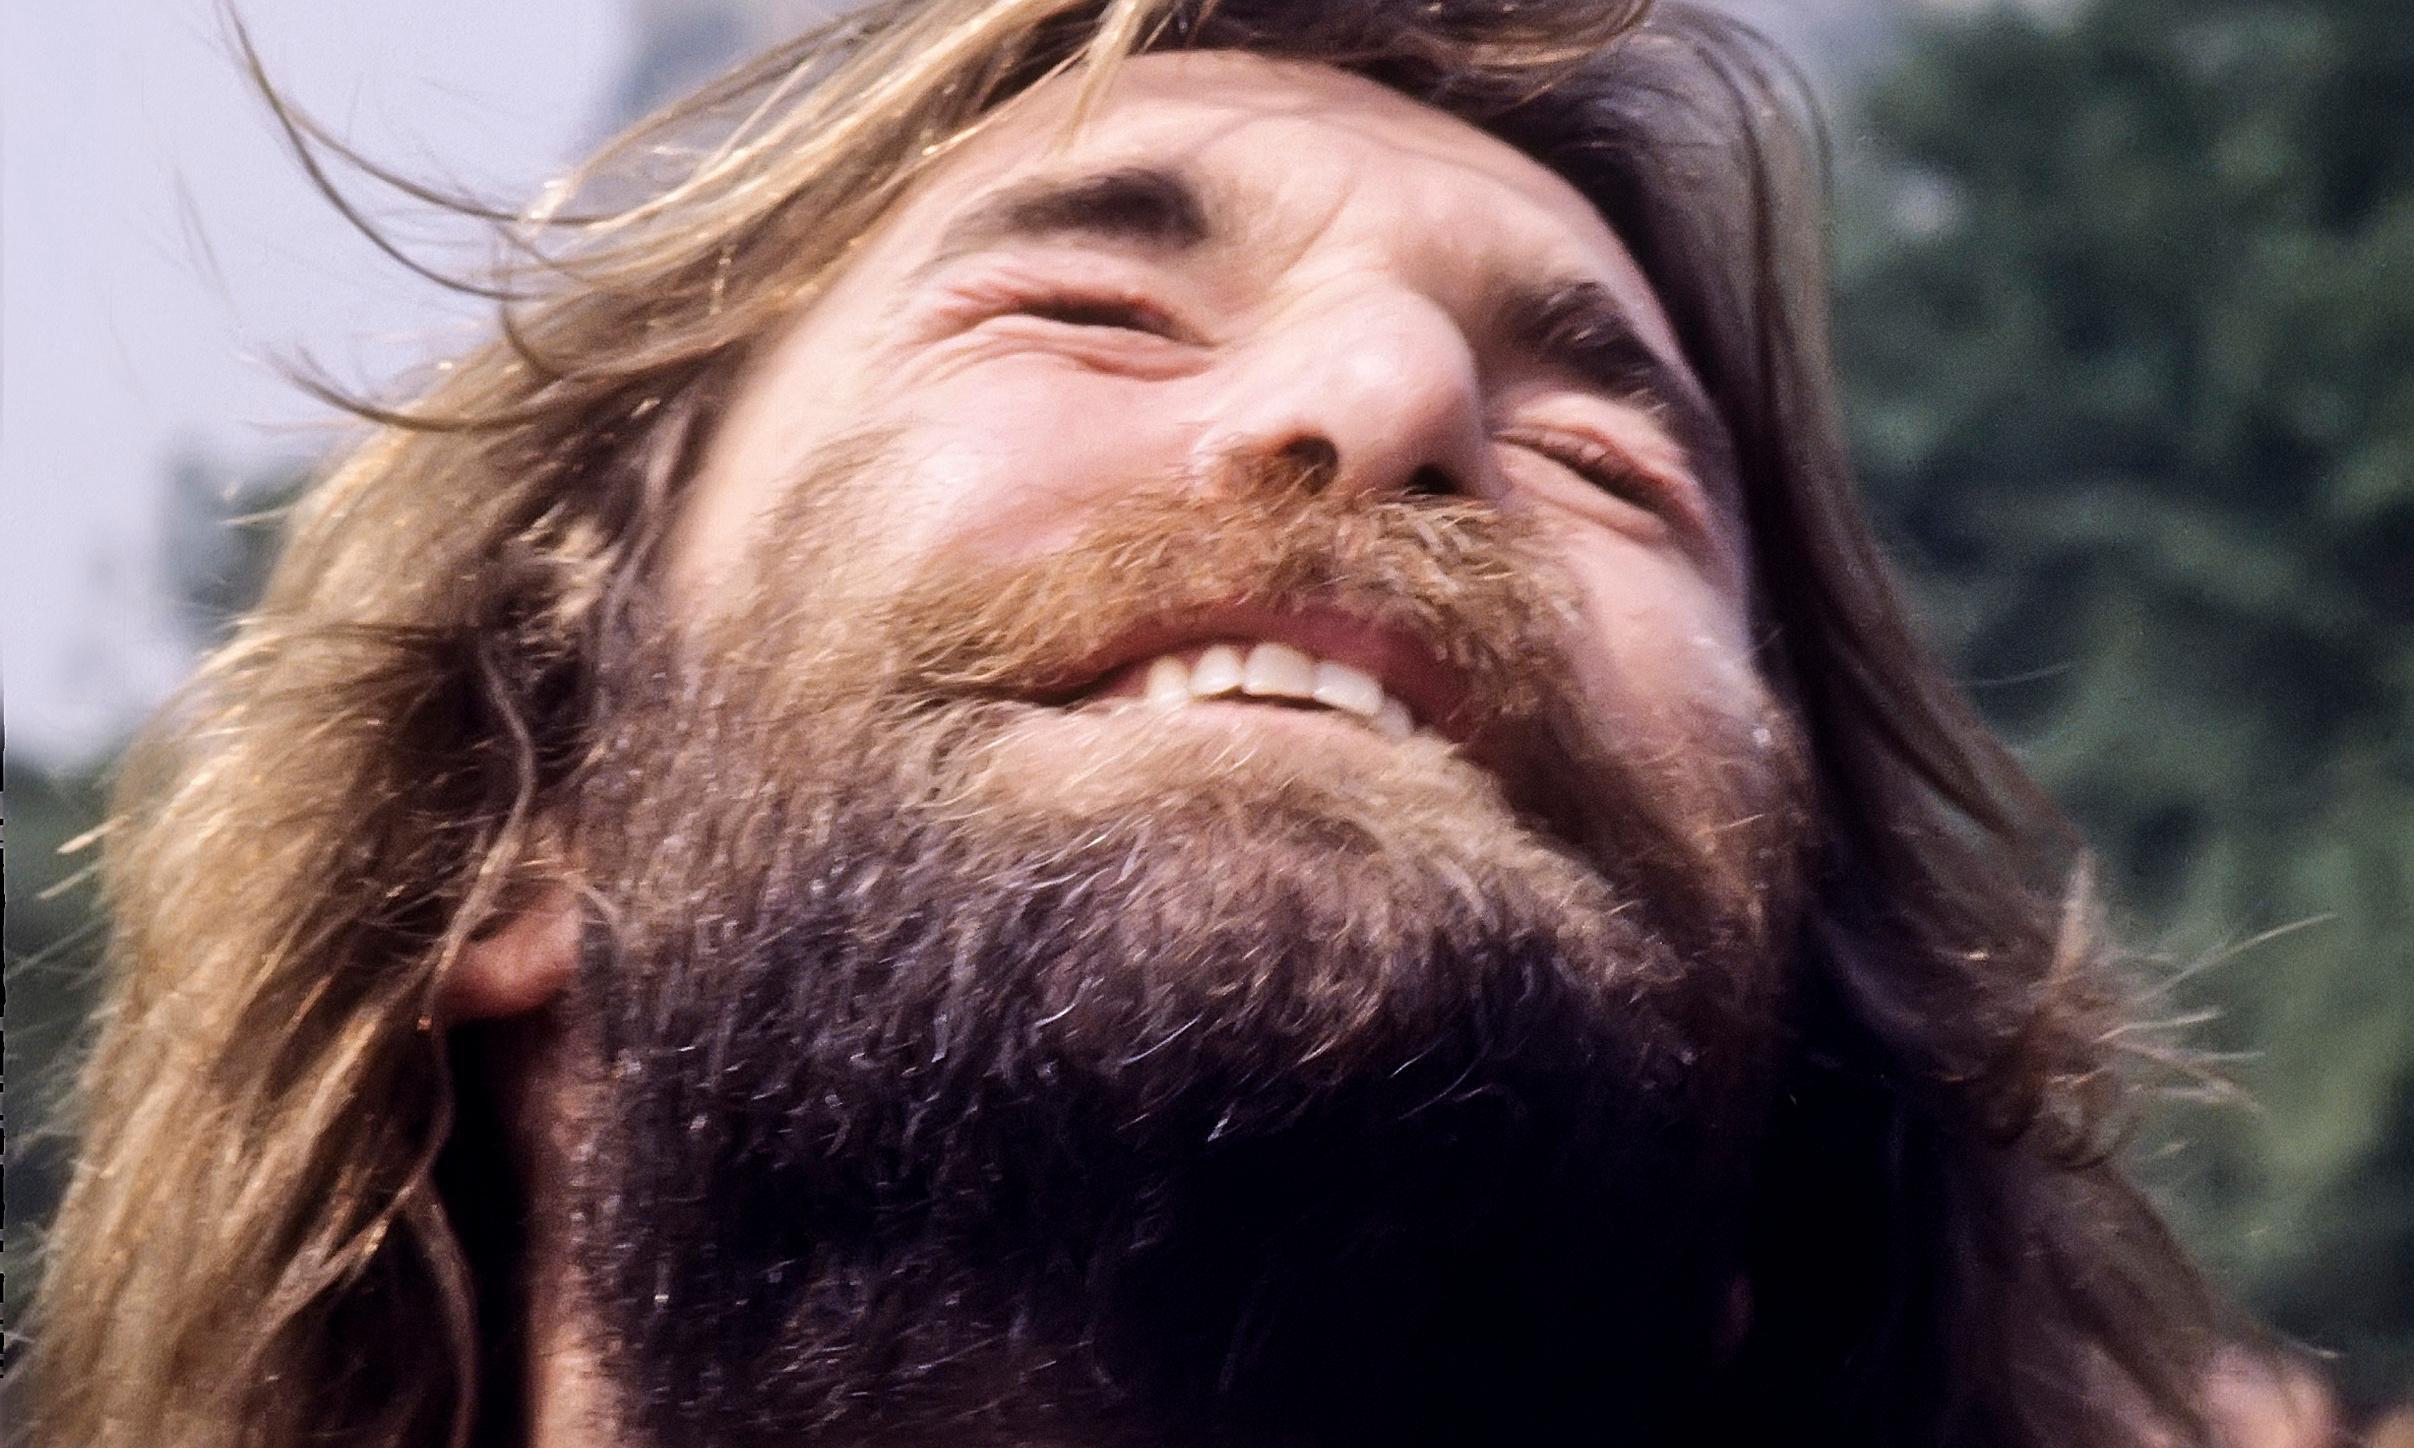 Pacific Ocean coup: how Ronald Reagan helped bury a Beach Boy at sea